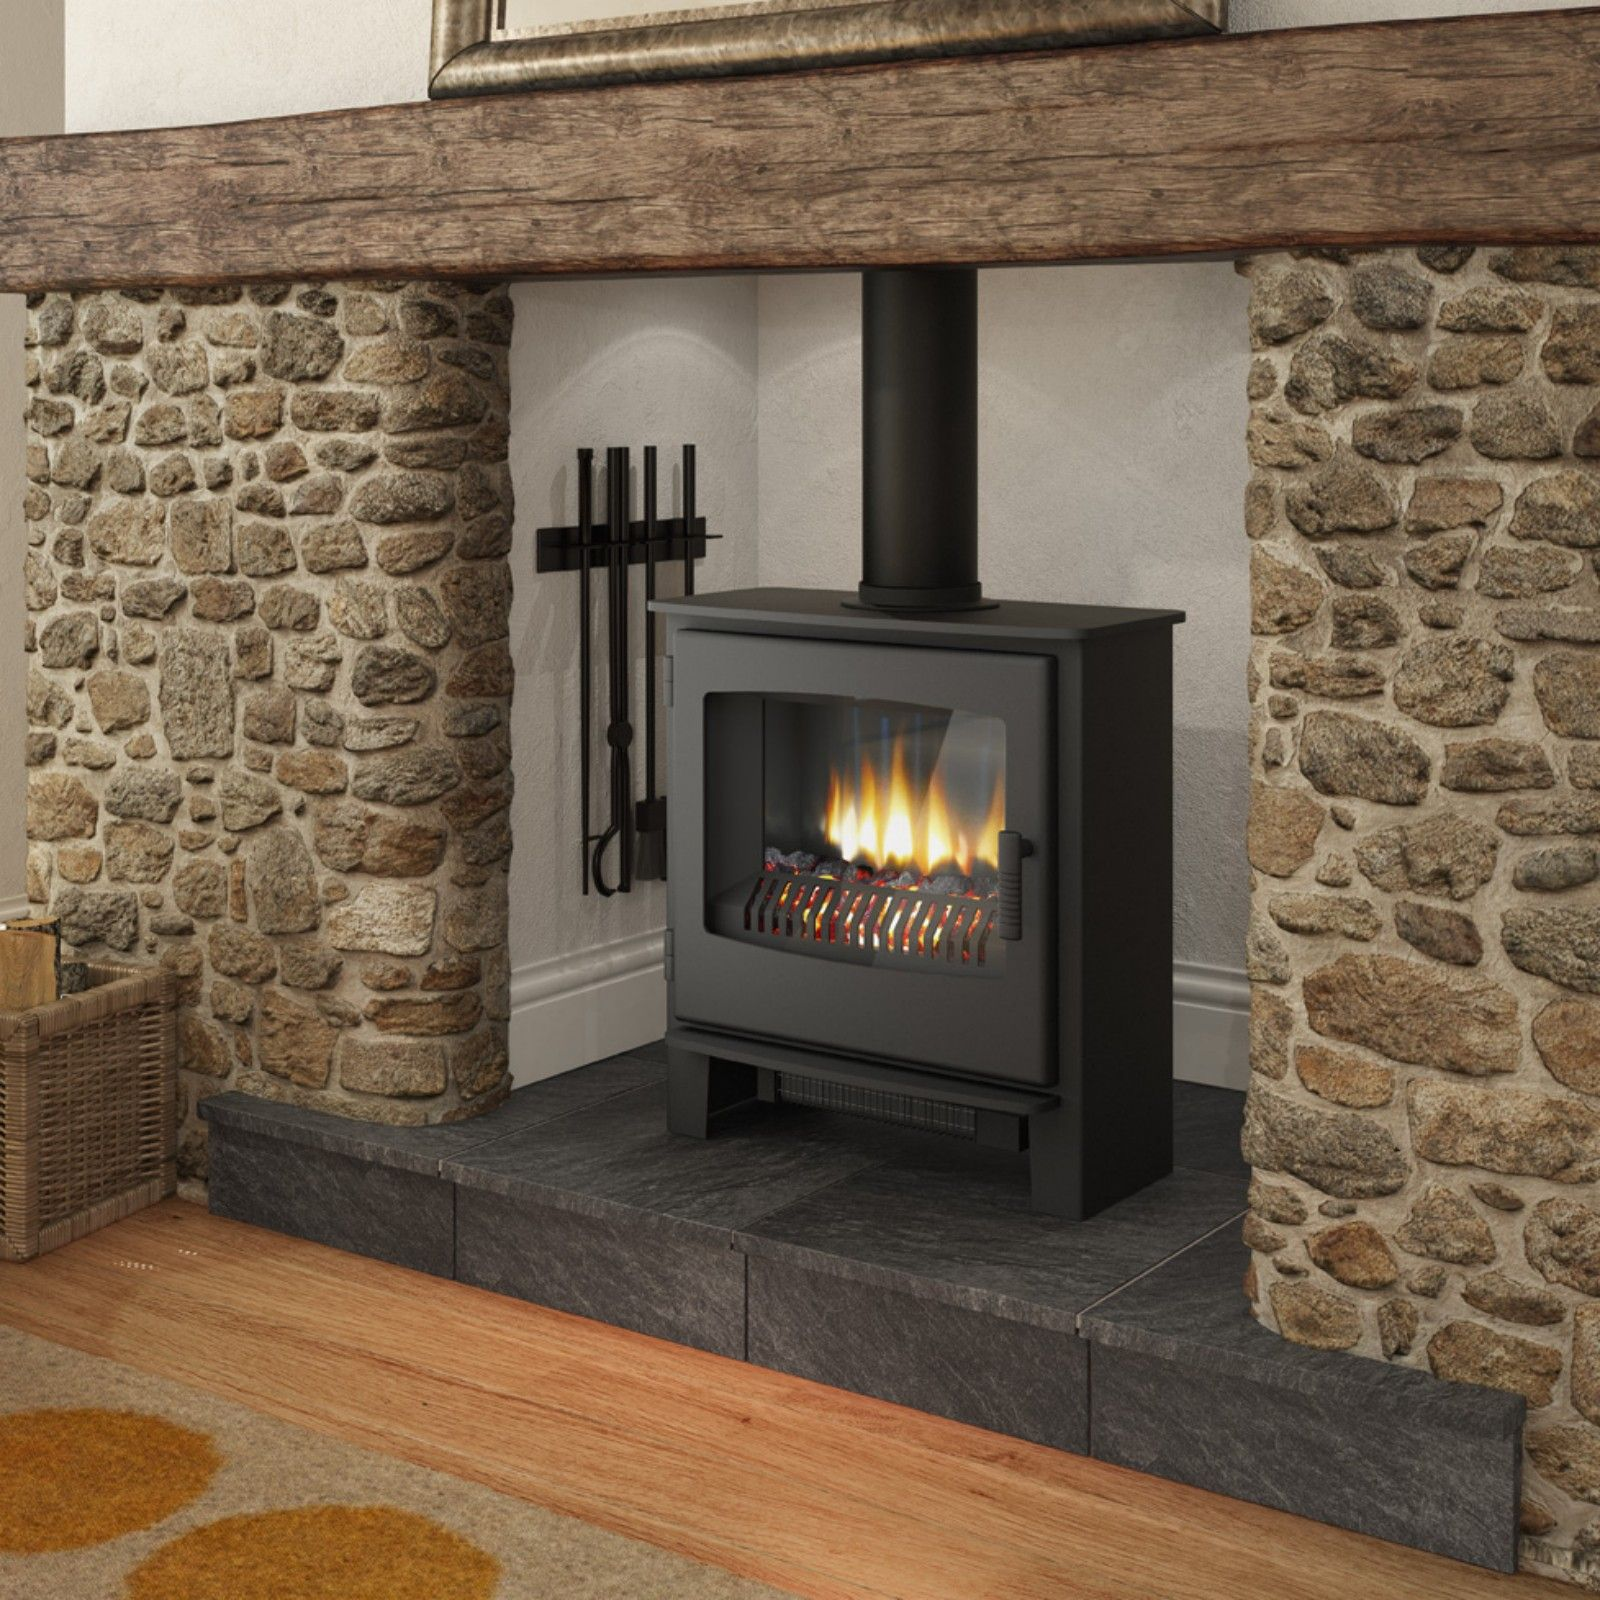 Broseley evolution desire 6 electric stove broseley